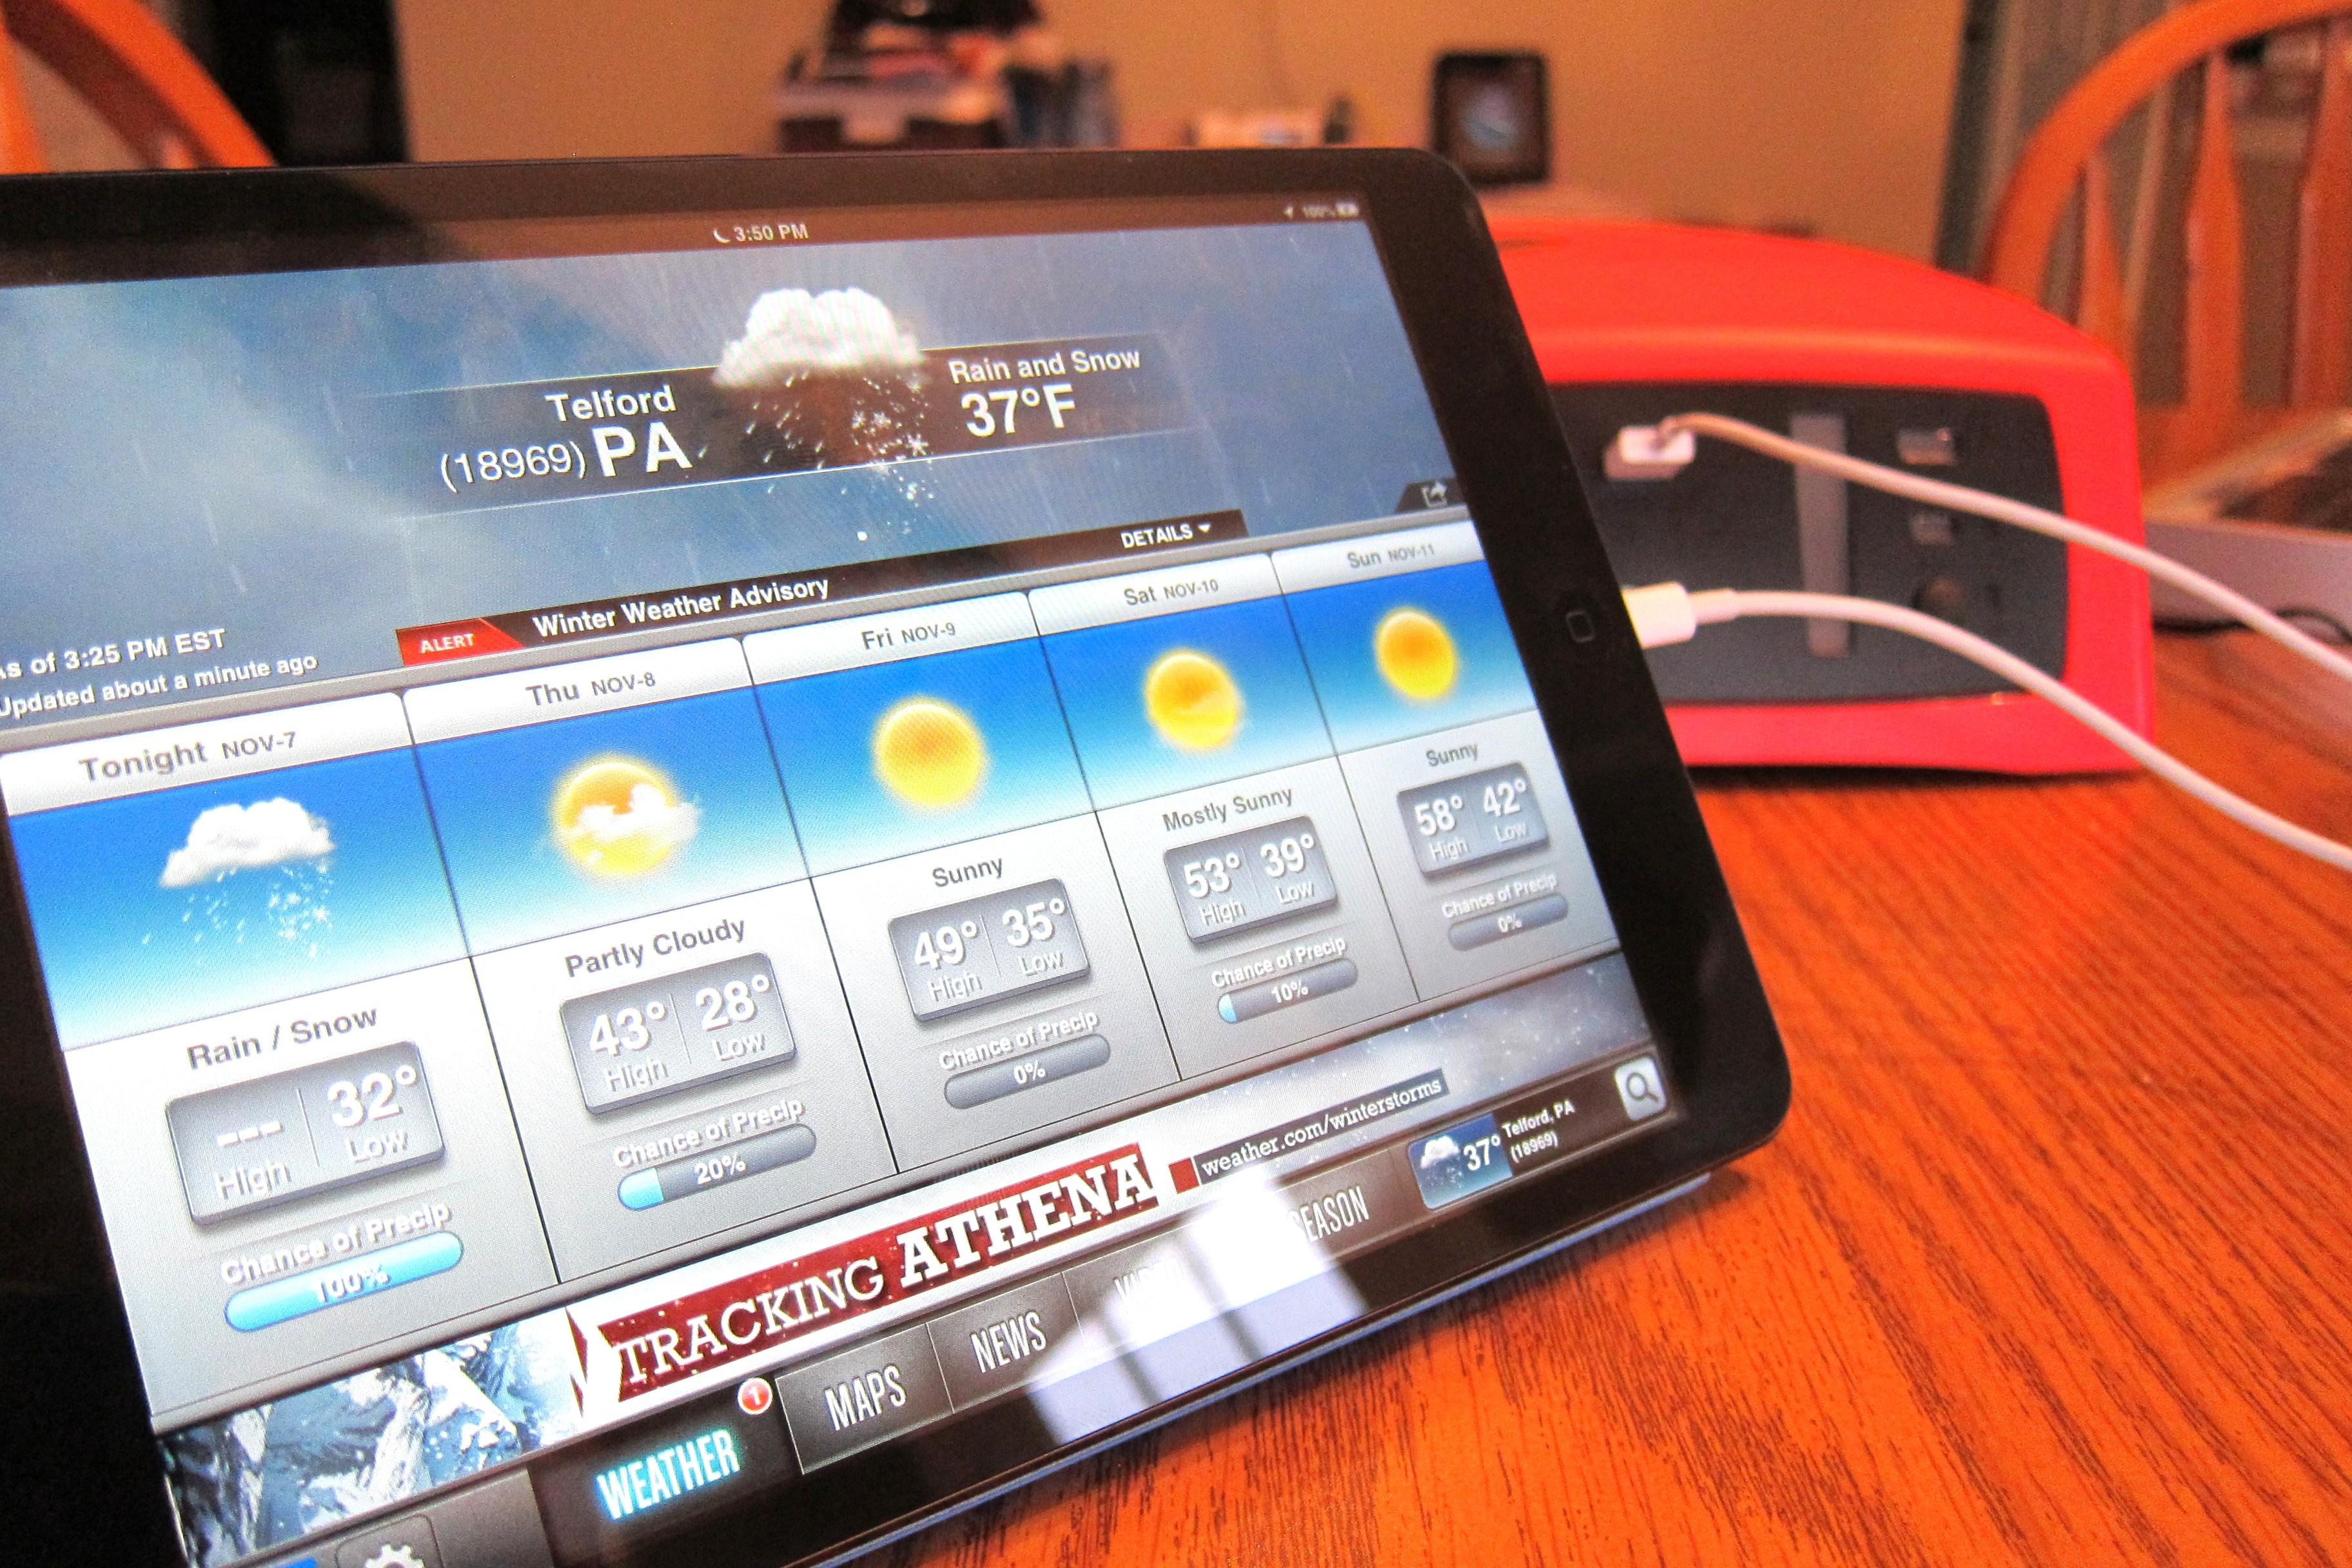 ReadySet charging iPad mini